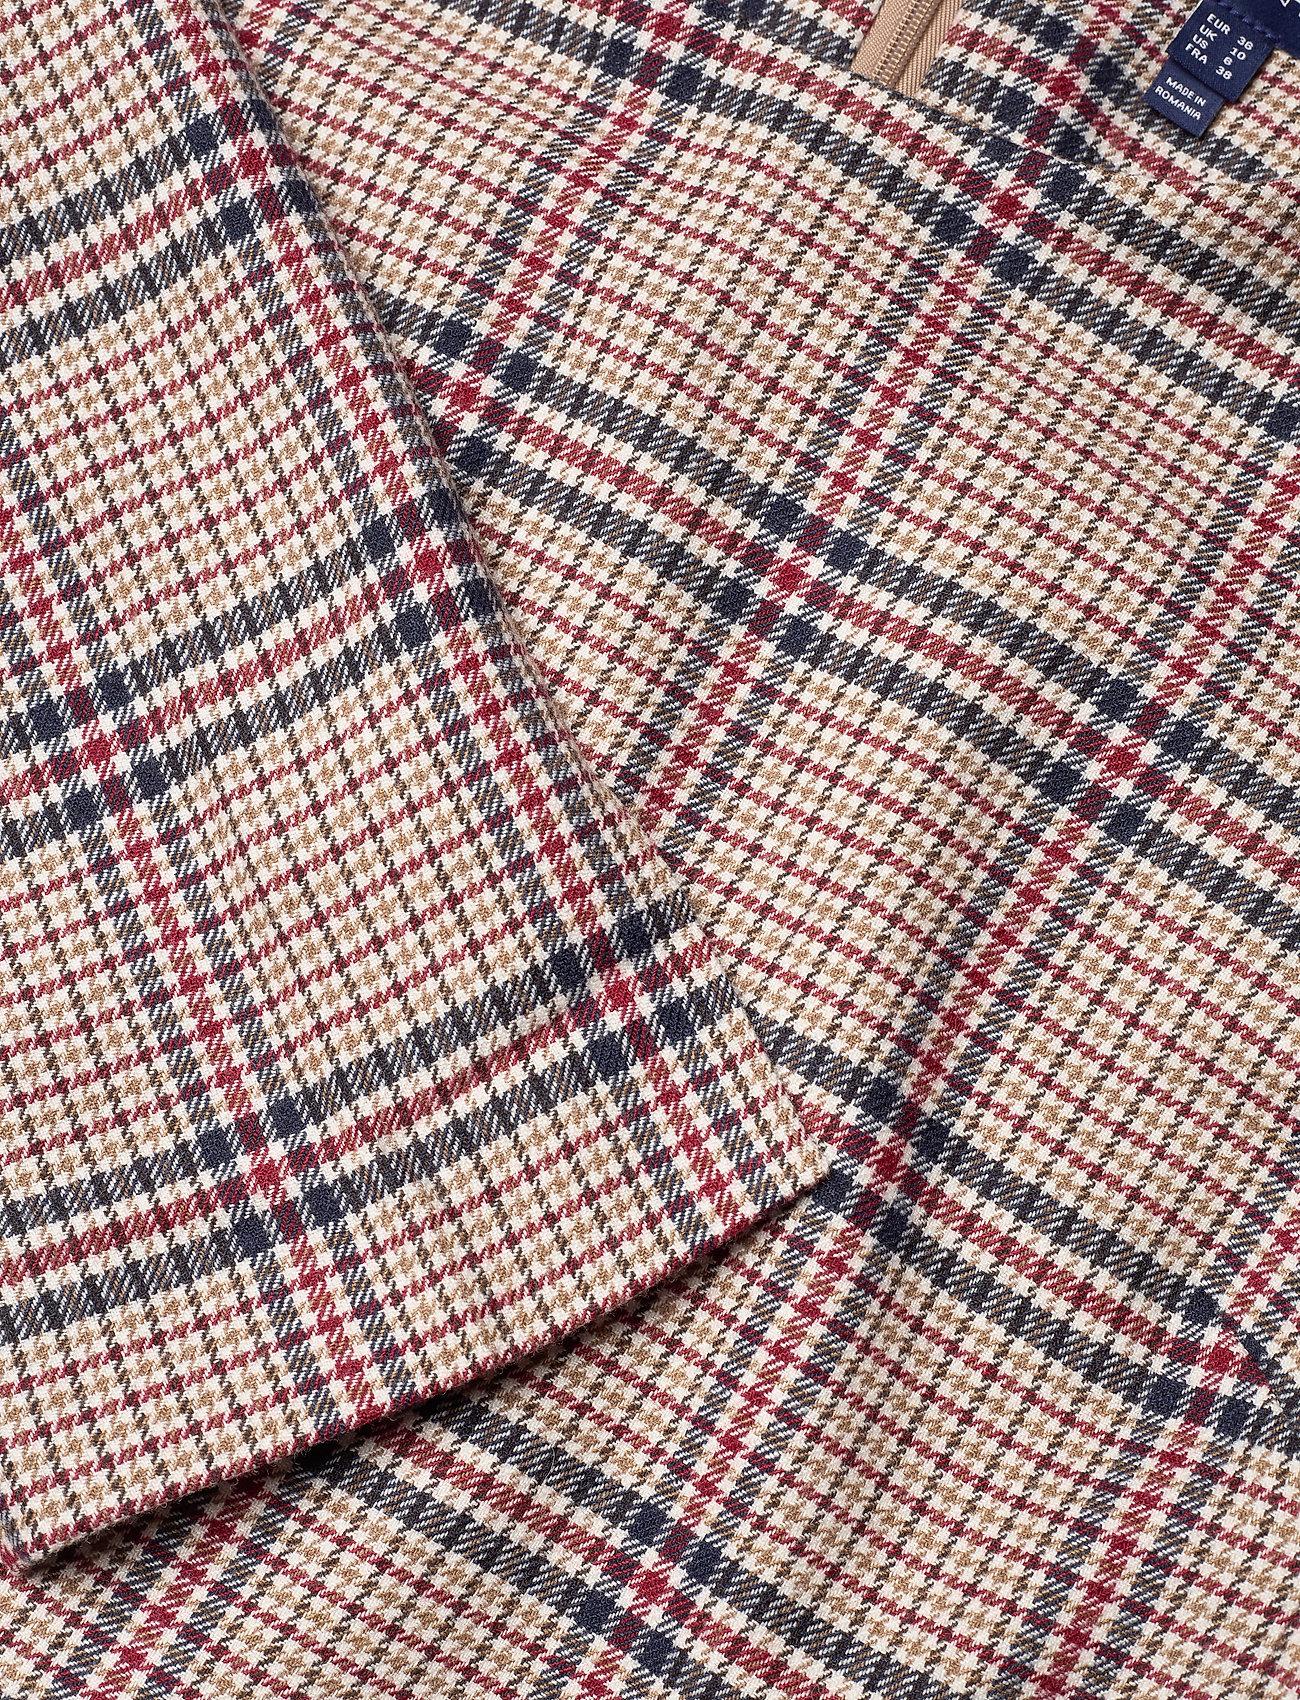 D1. Washable Str Wool A-line Dress (Warm Khaki) (149.99 €) - GANT bbxf7